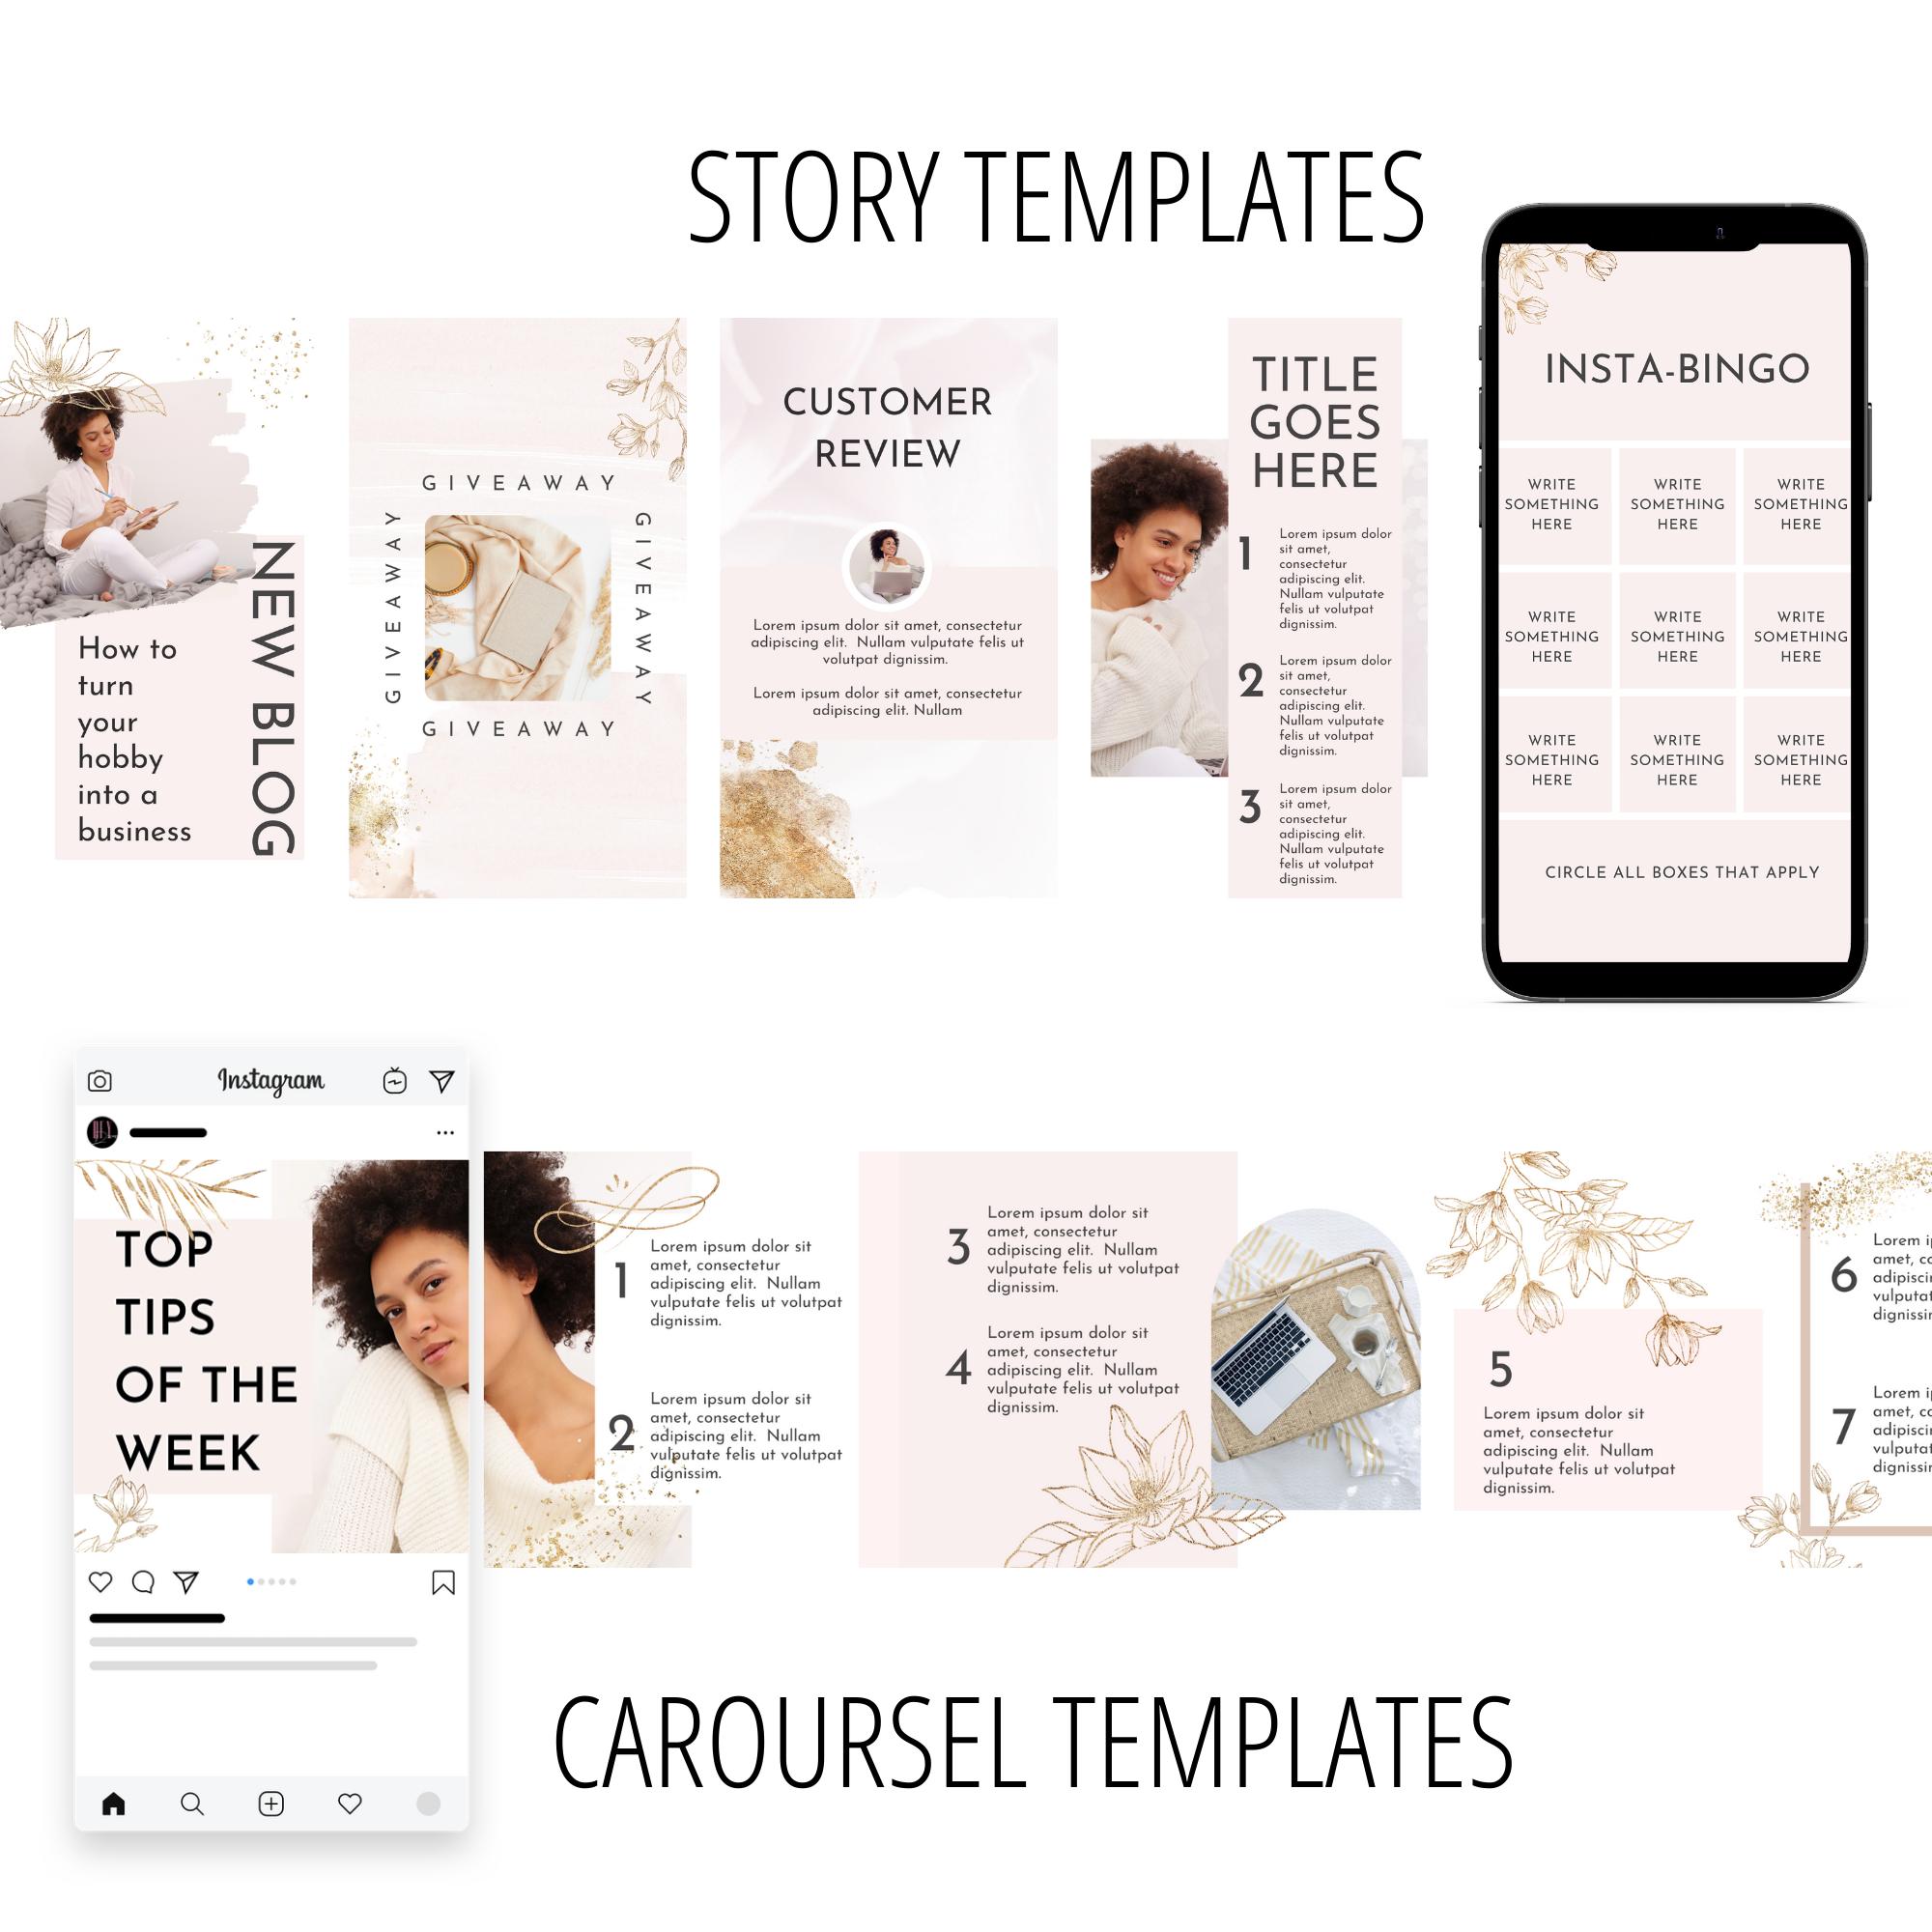 canva carousel templates